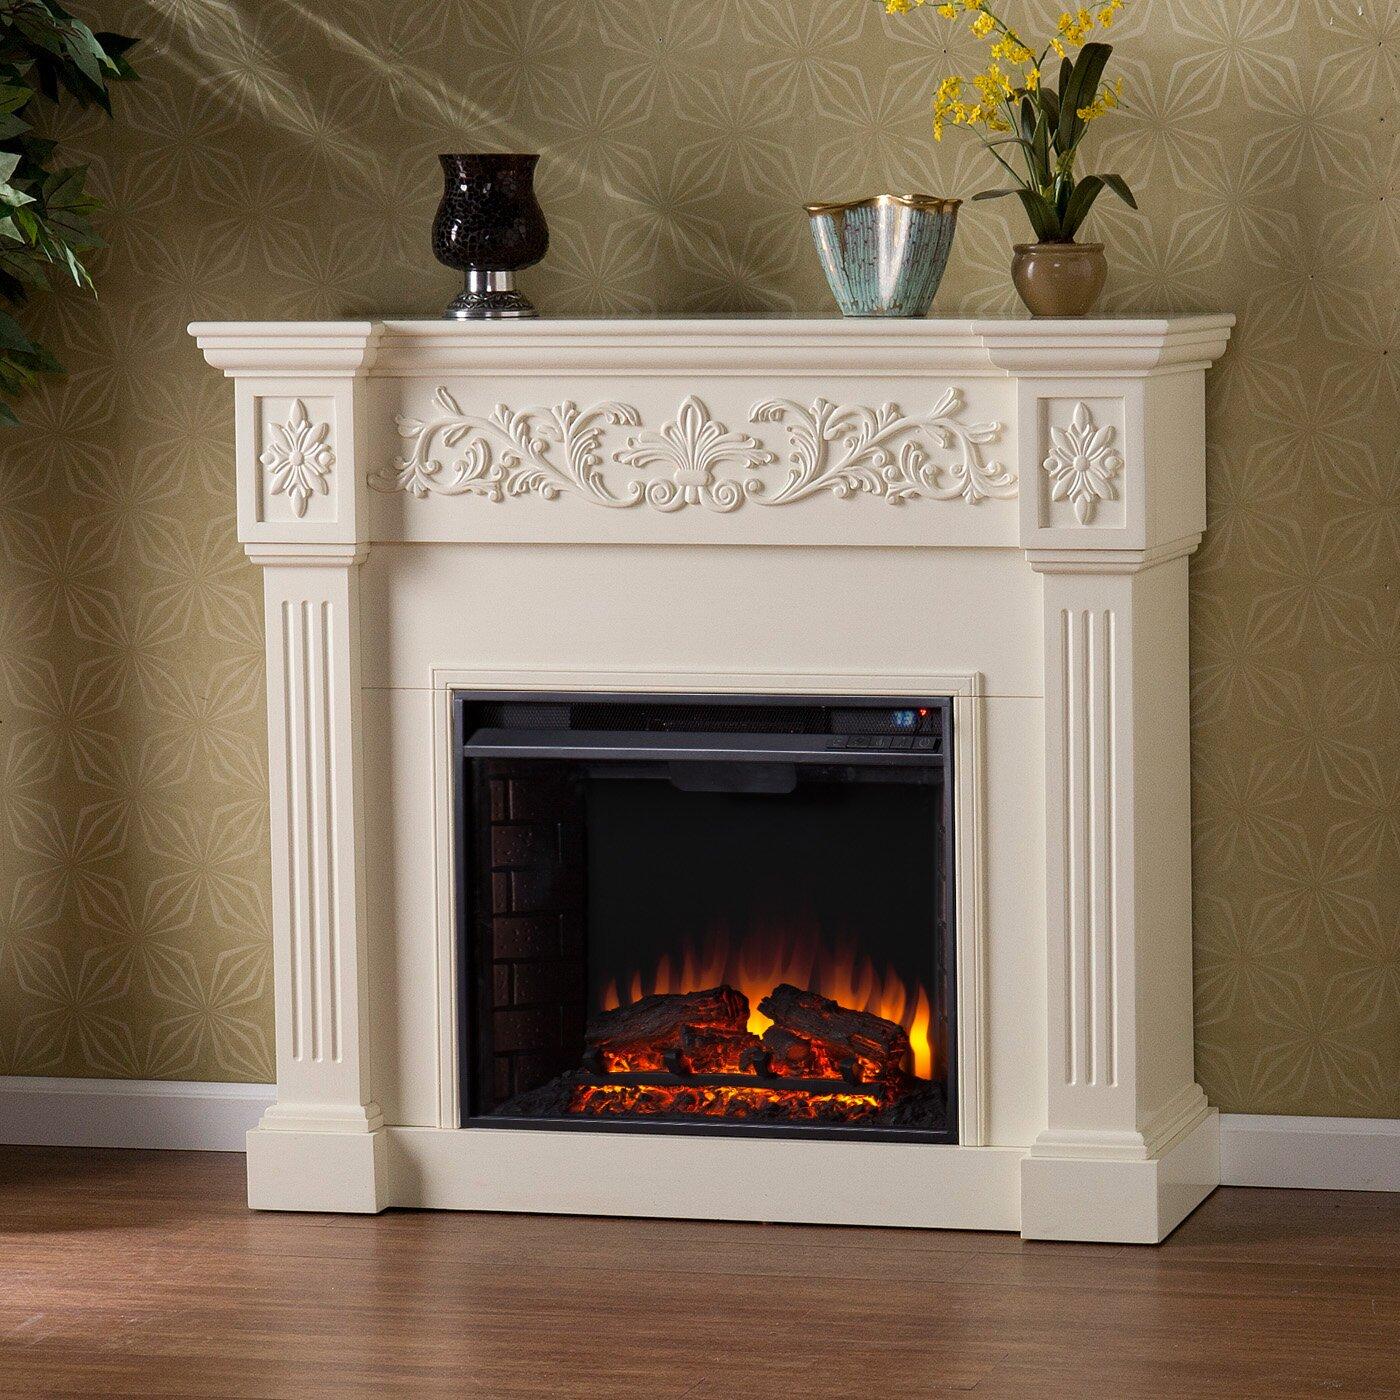 Alcott Hill Galgorm Parks Electric Fireplace Amp Reviews Wayfair . - Classic Flame Electric Fireplaces Dimplex Electric Fireplaces